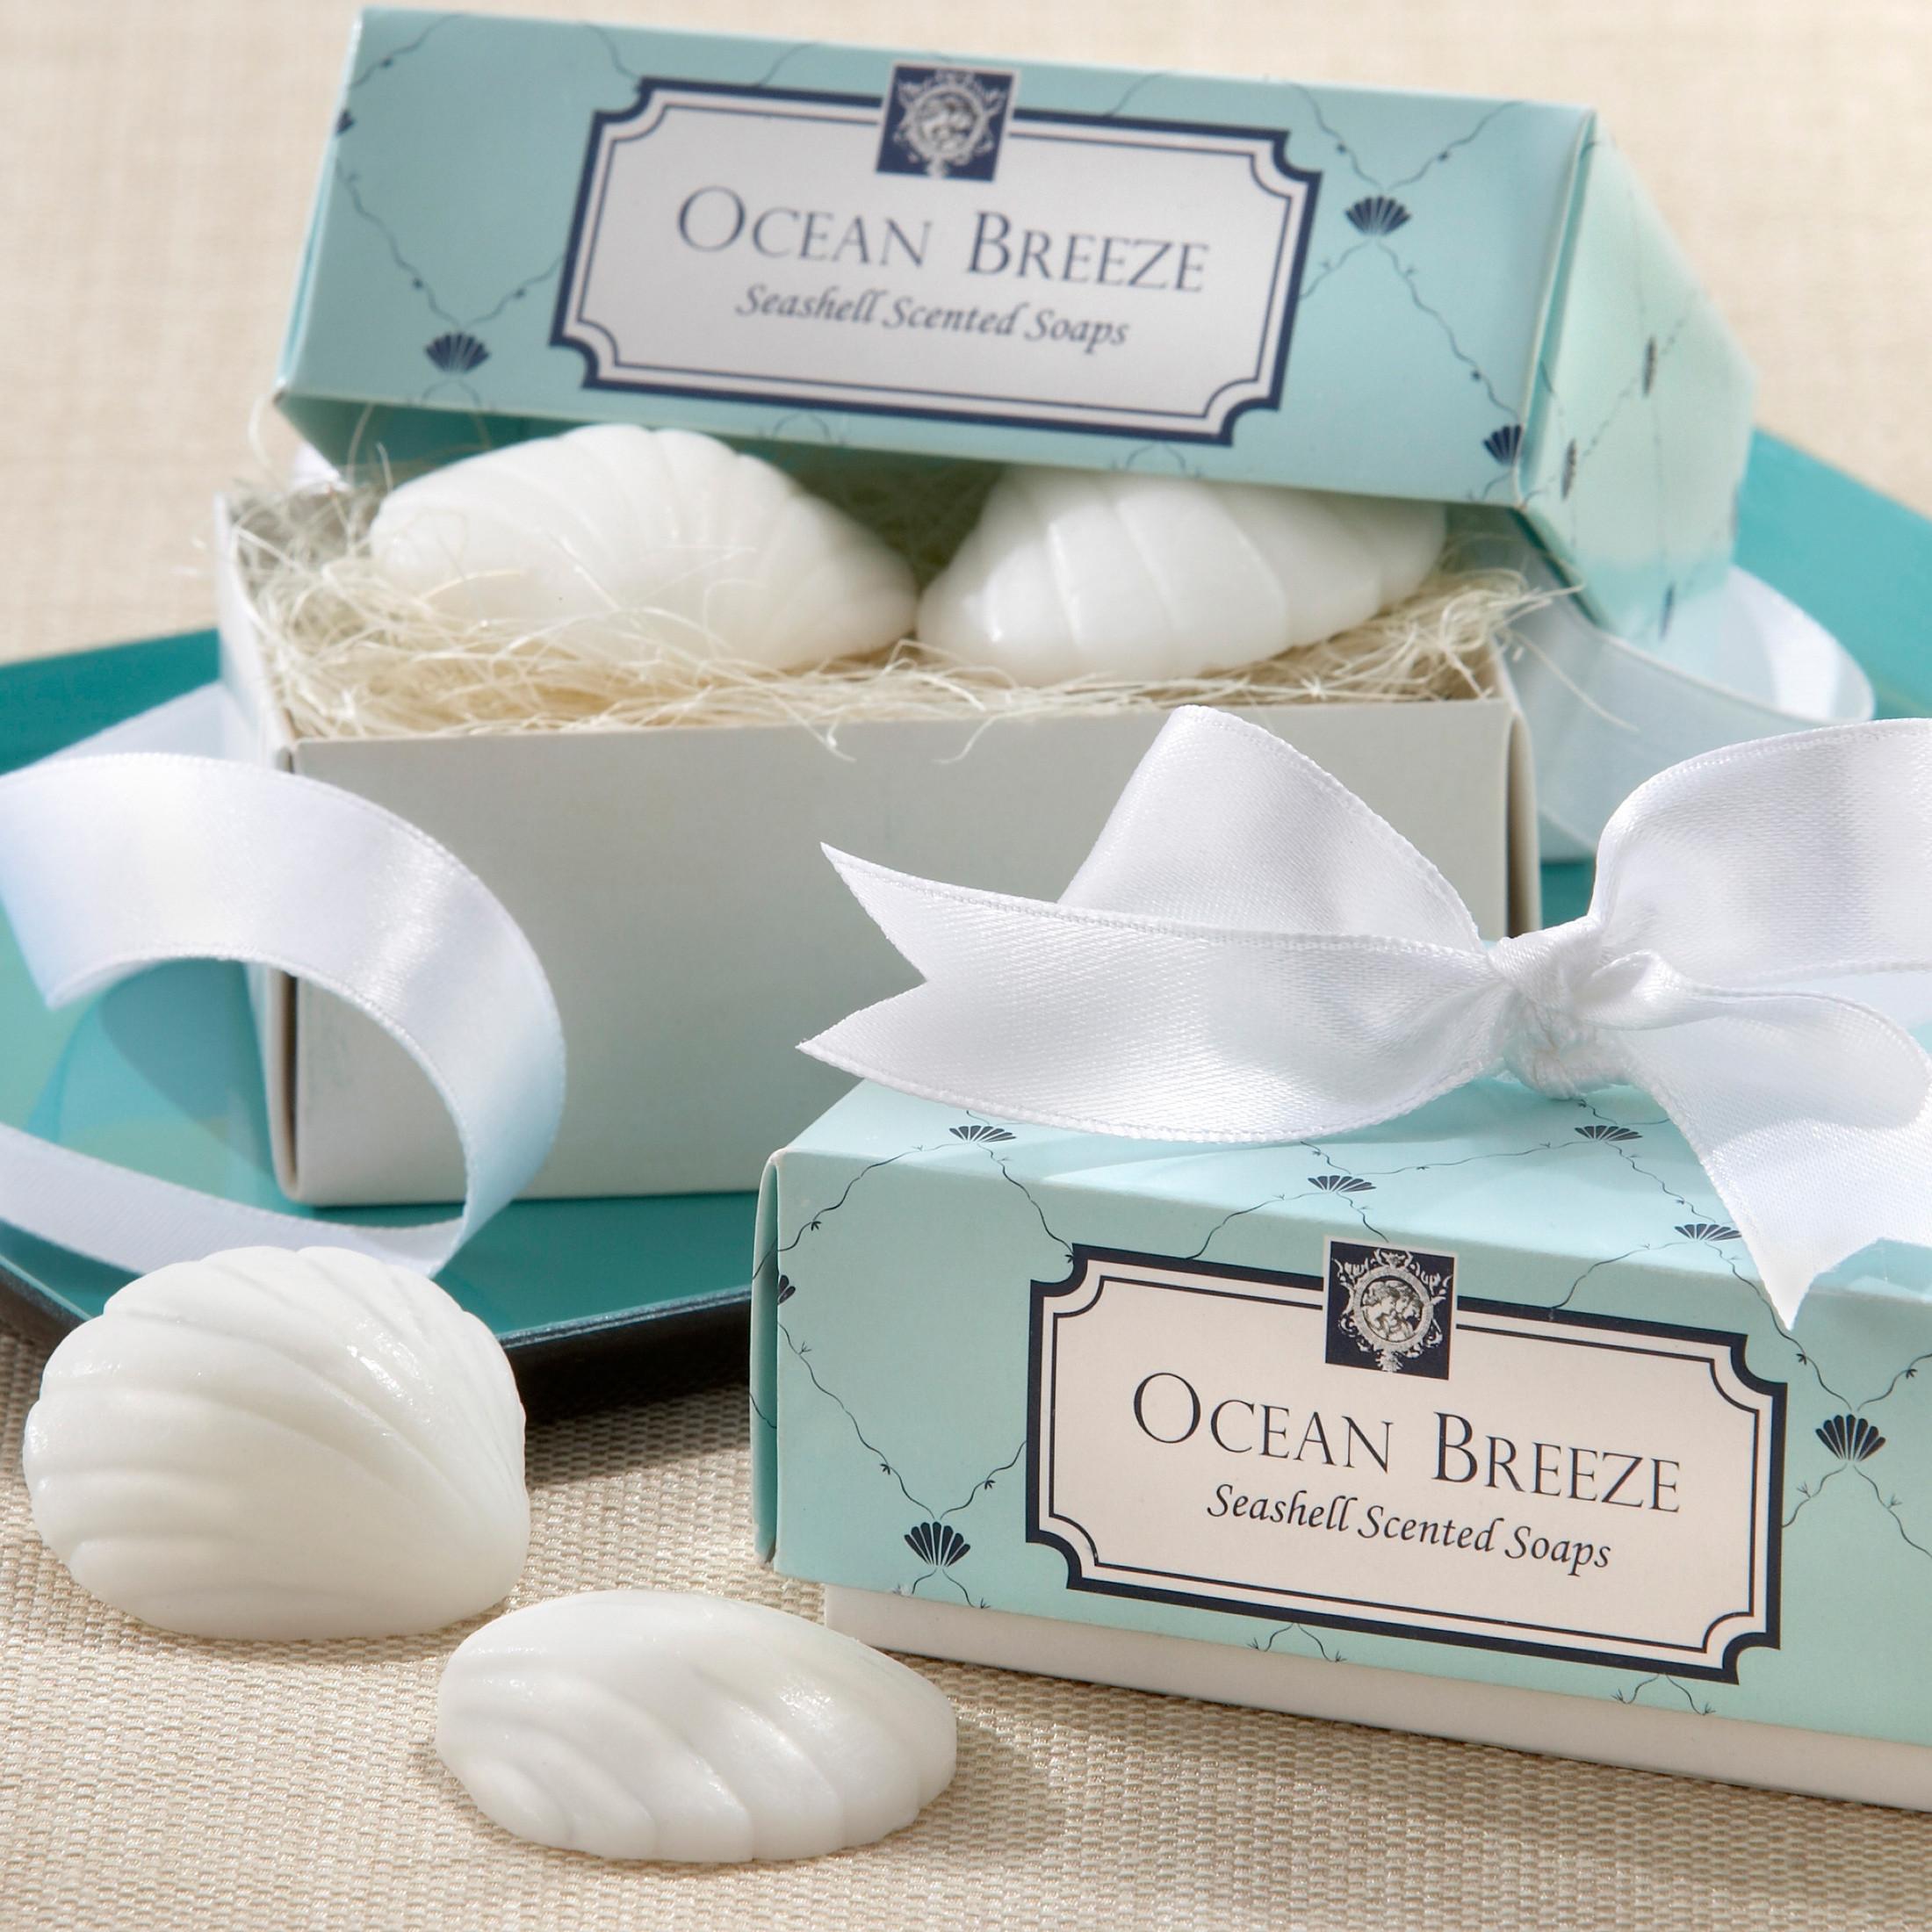 ocean breeze seashell scented soaps wedding favor soap wedding favors